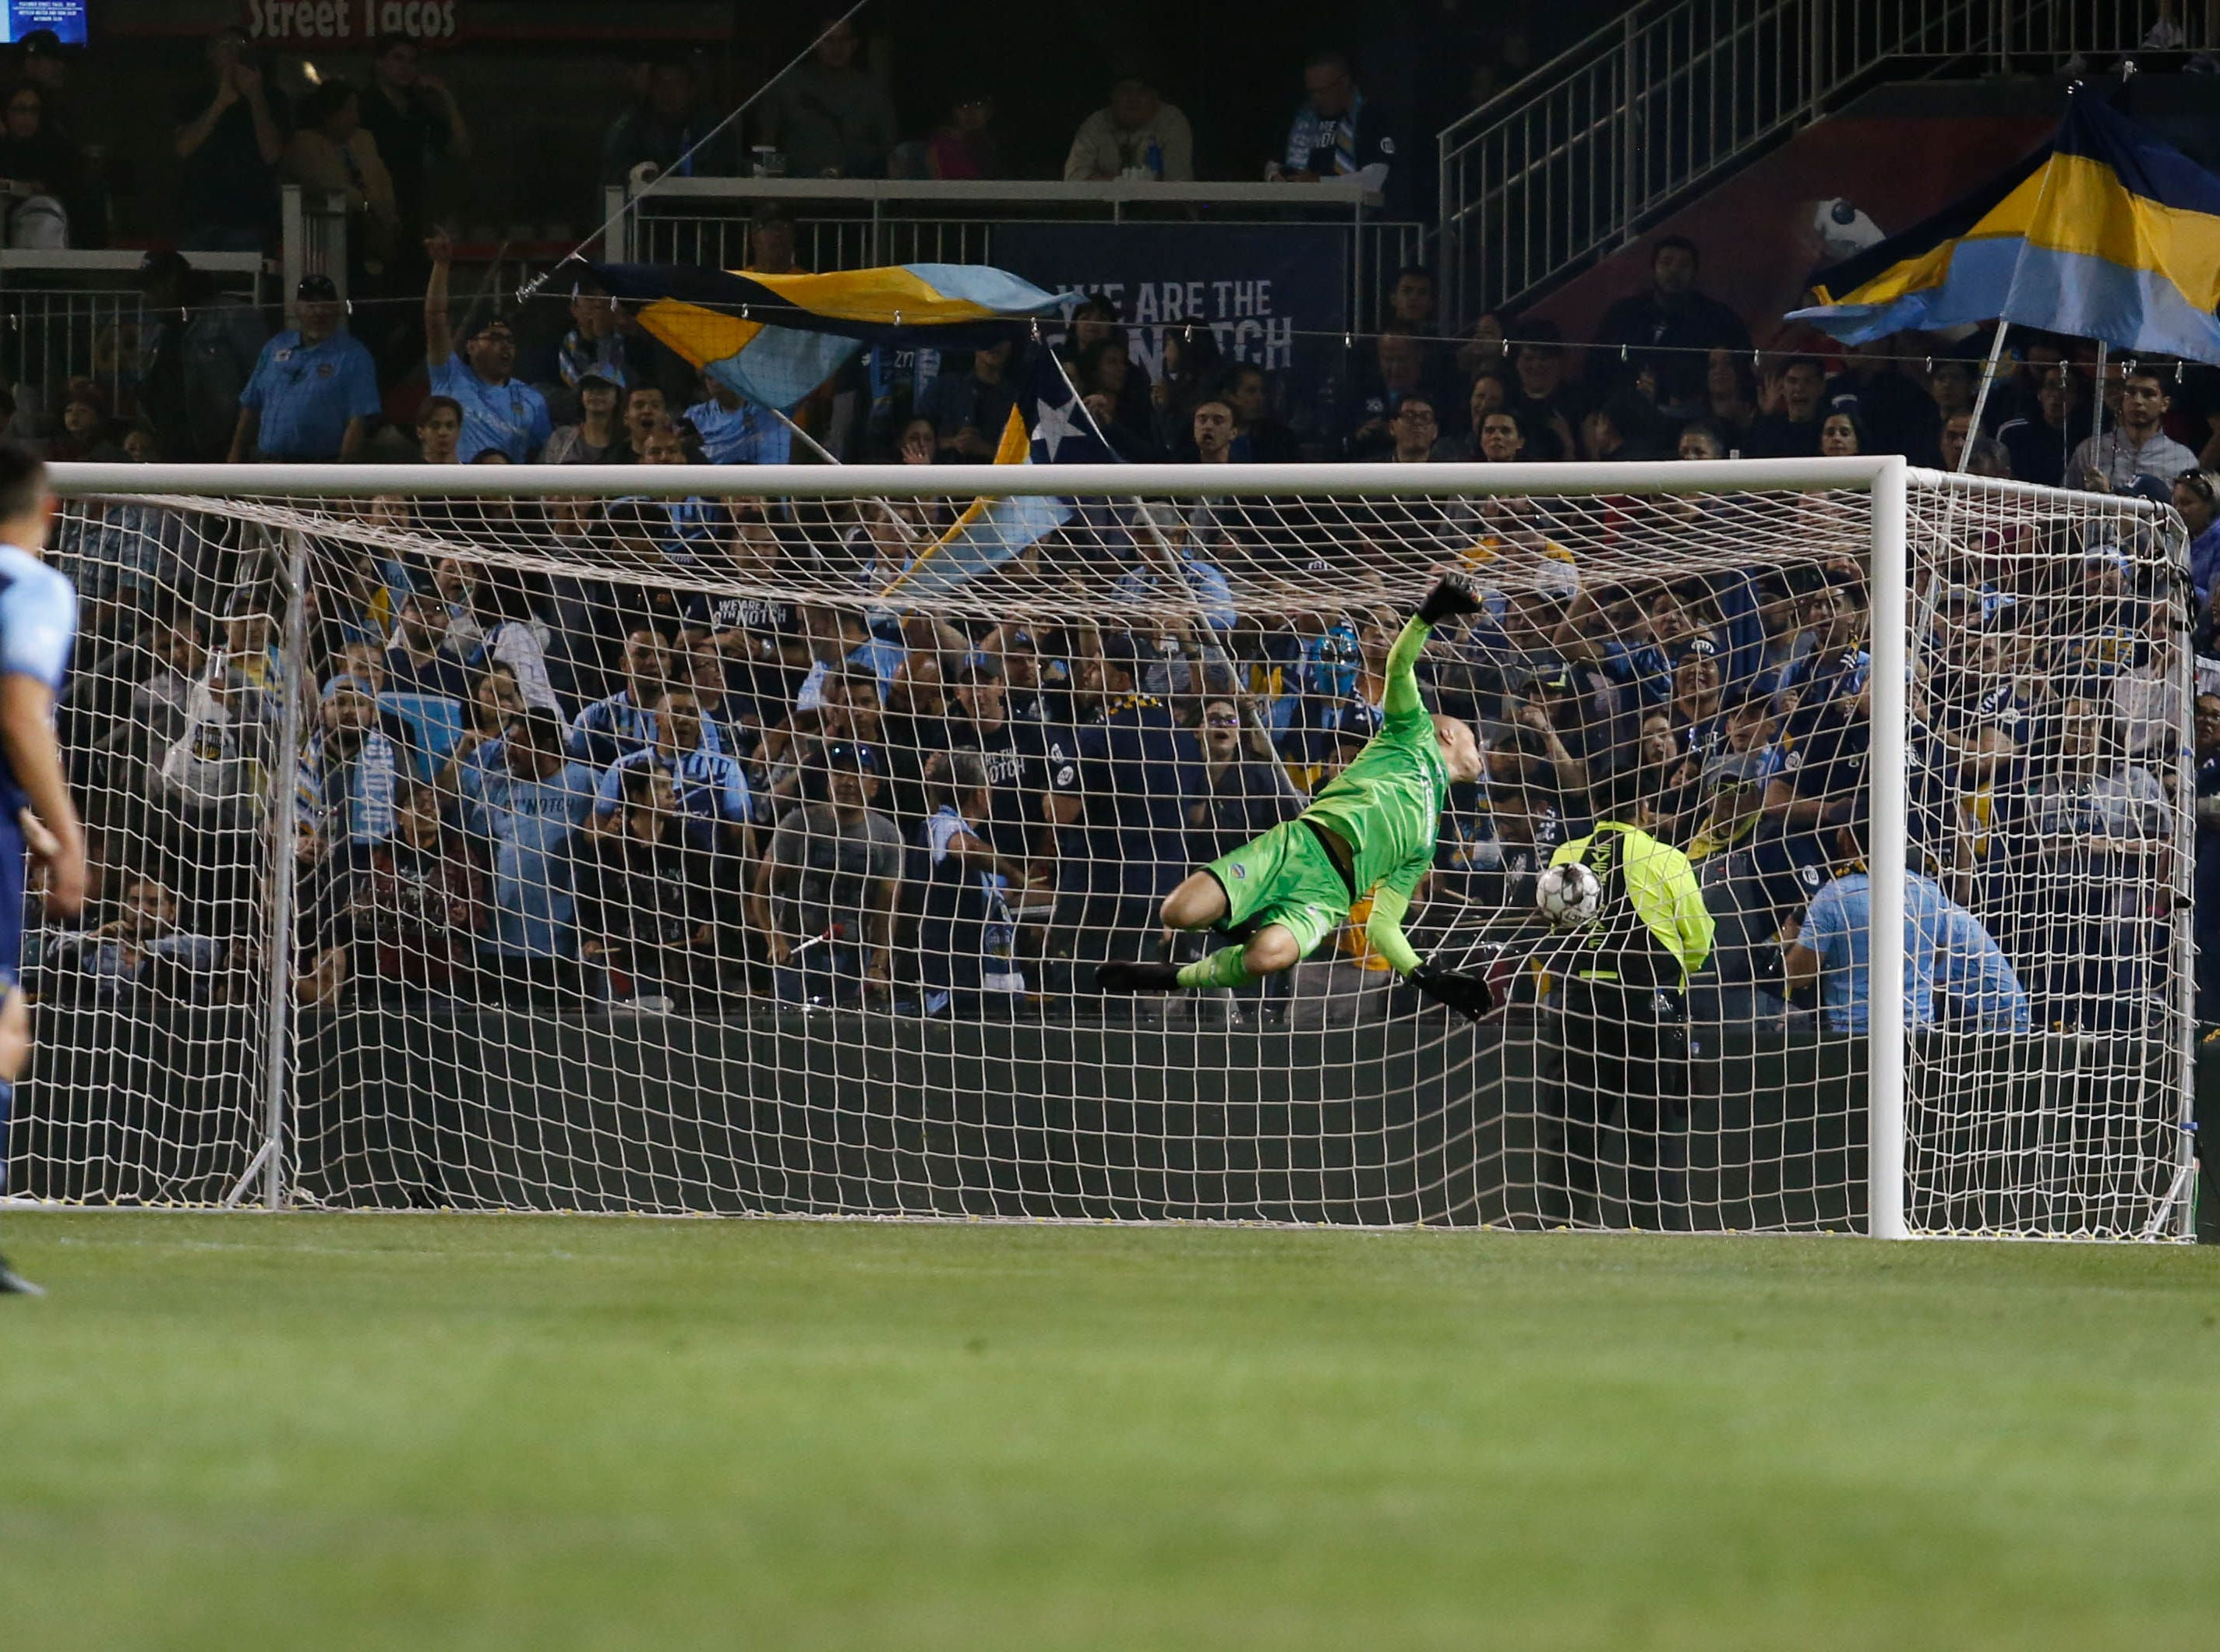 El Paso Locomotive goalkeeper Logan Ketterer misses a late shot for goal by Rio Grande Valley defender Romilio Hernandez in the 79th minute.